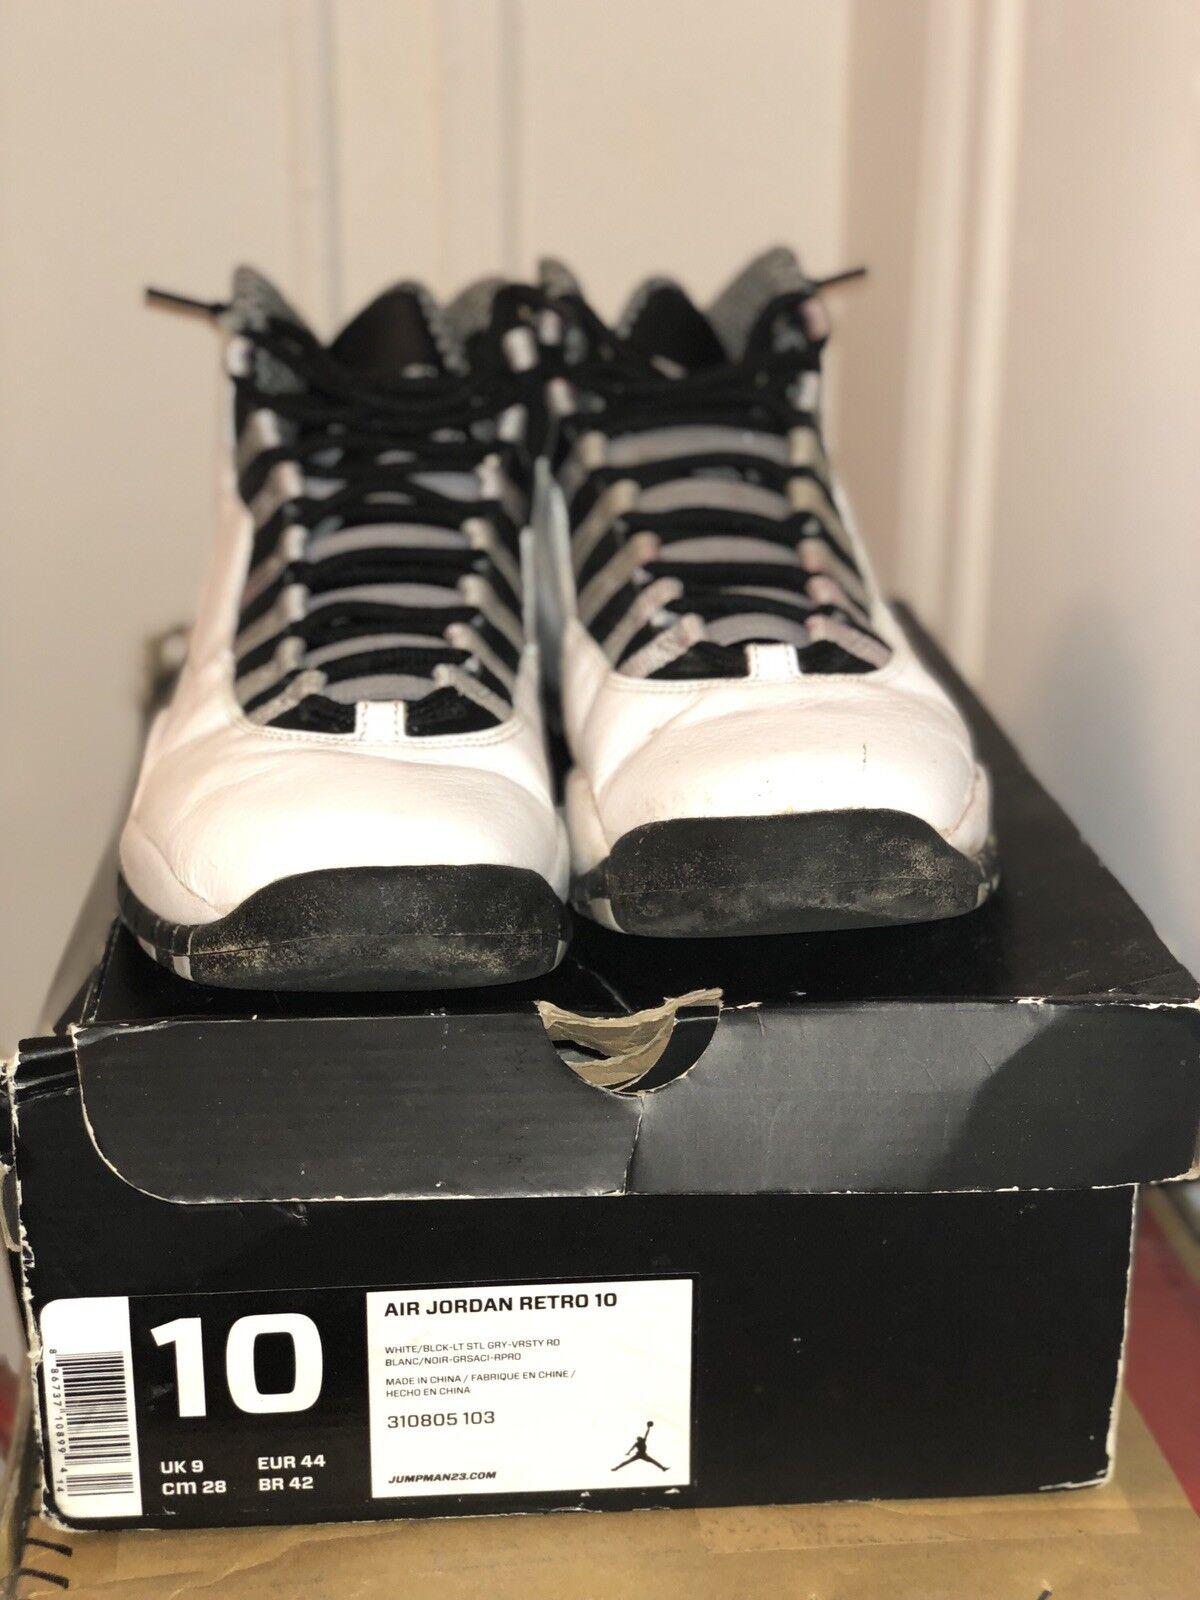 Jordan Steel 10 Size 10